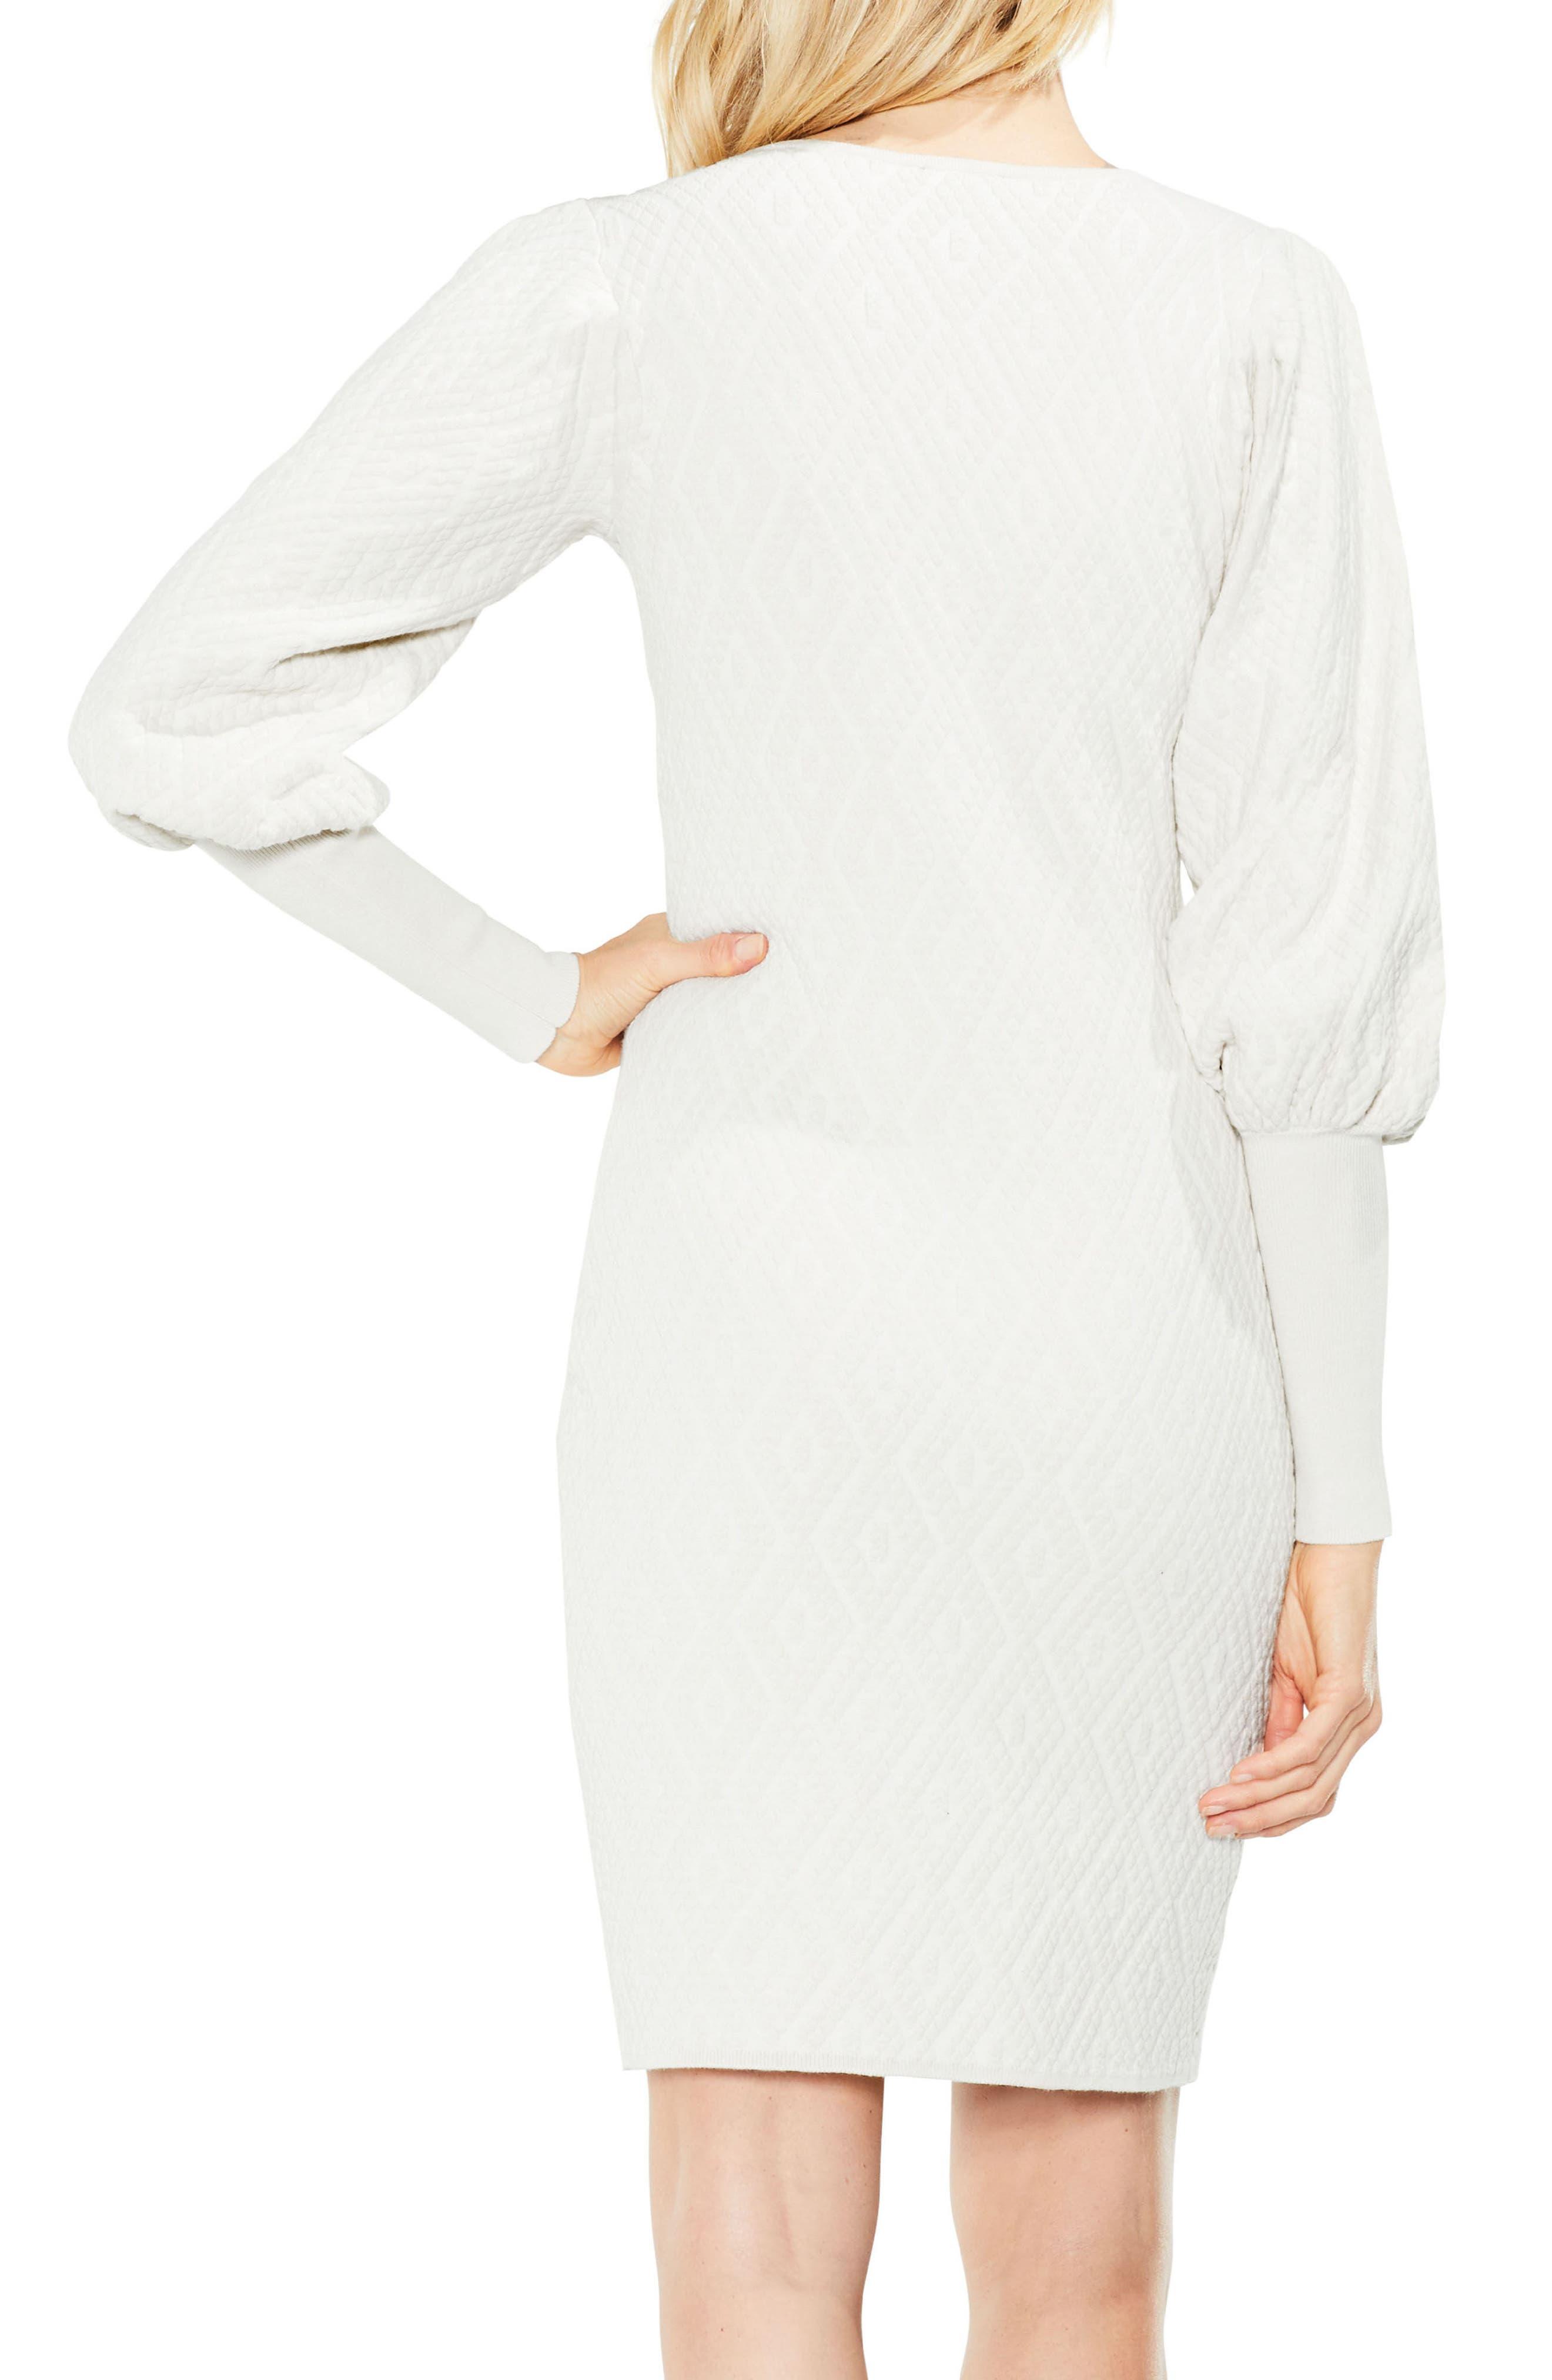 Bubble Sleeve Textured Jacquard Dress,                             Alternate thumbnail 2, color,                             Pearl Ivory